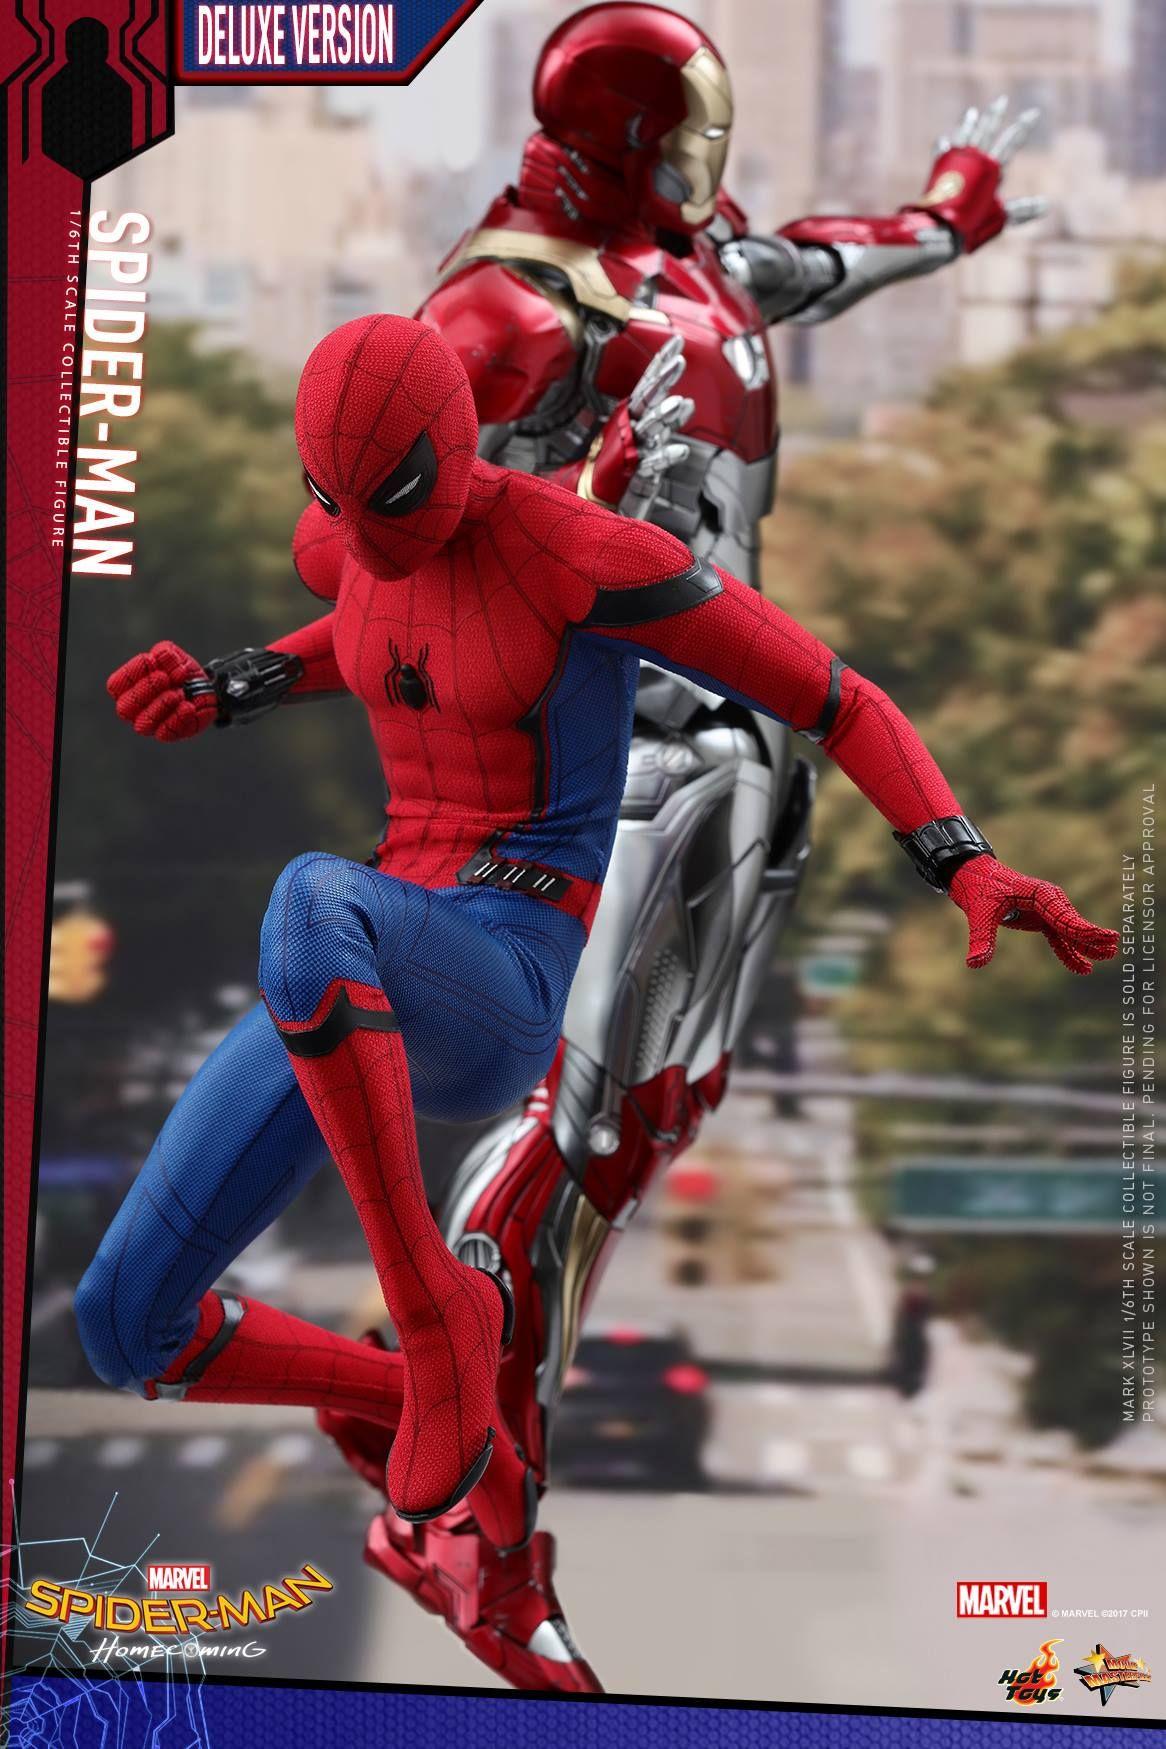 6/'/' Marvel Iron Armor Spider-Man Spiderman Hero Action Figure Collection